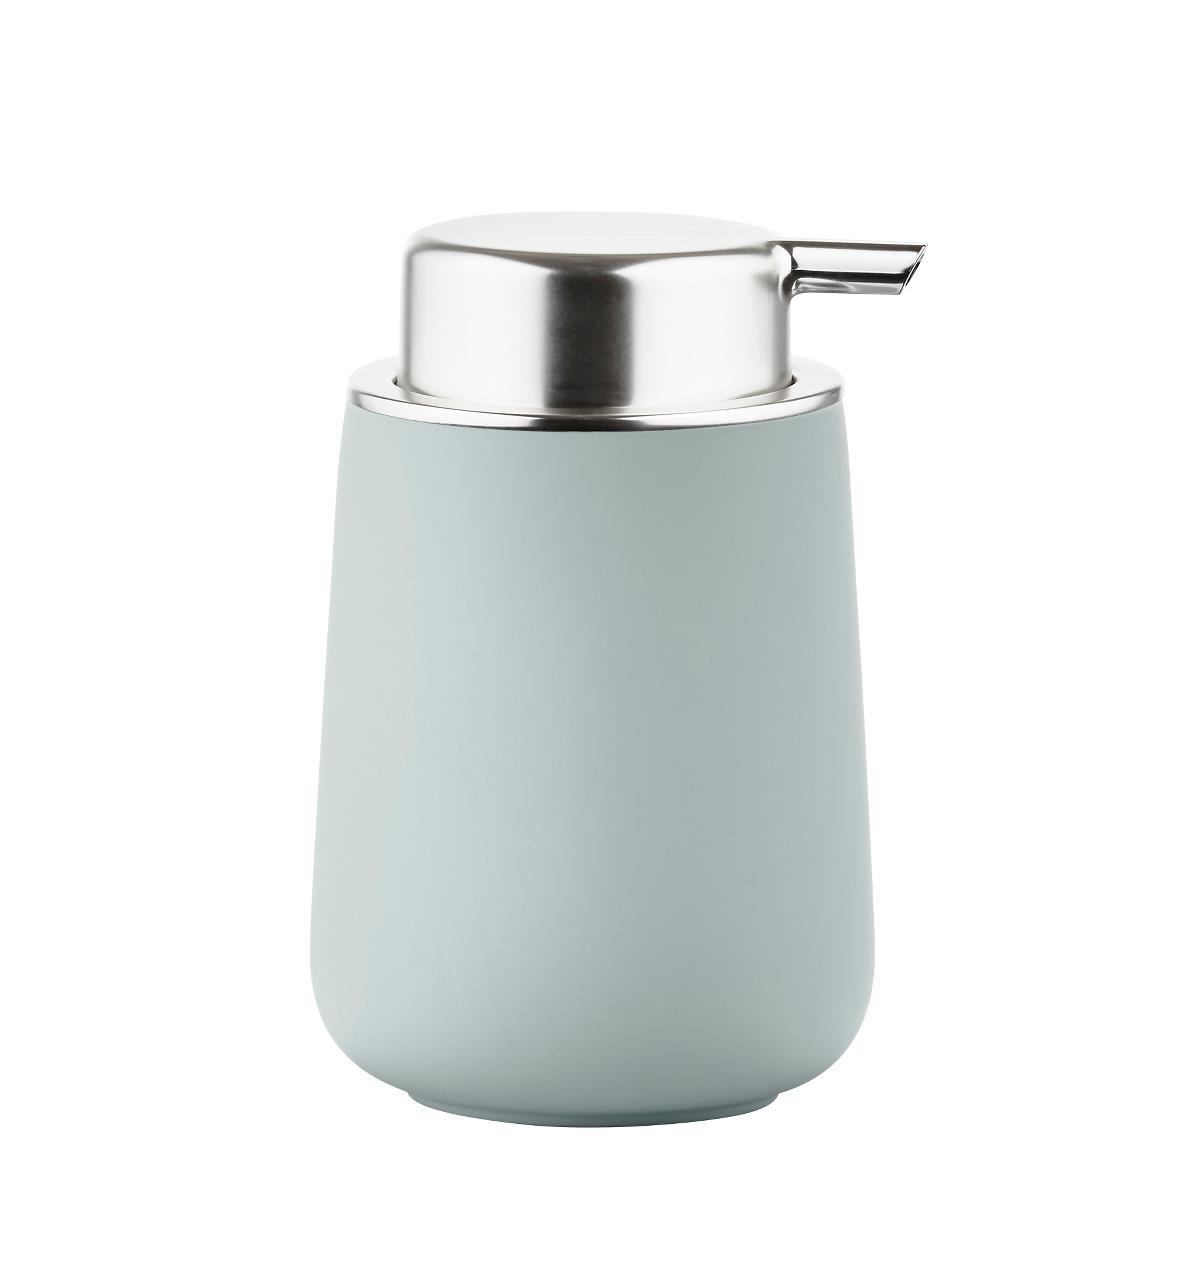 Dozator pentru sapun Nova, Zone-Verde Mint imagine